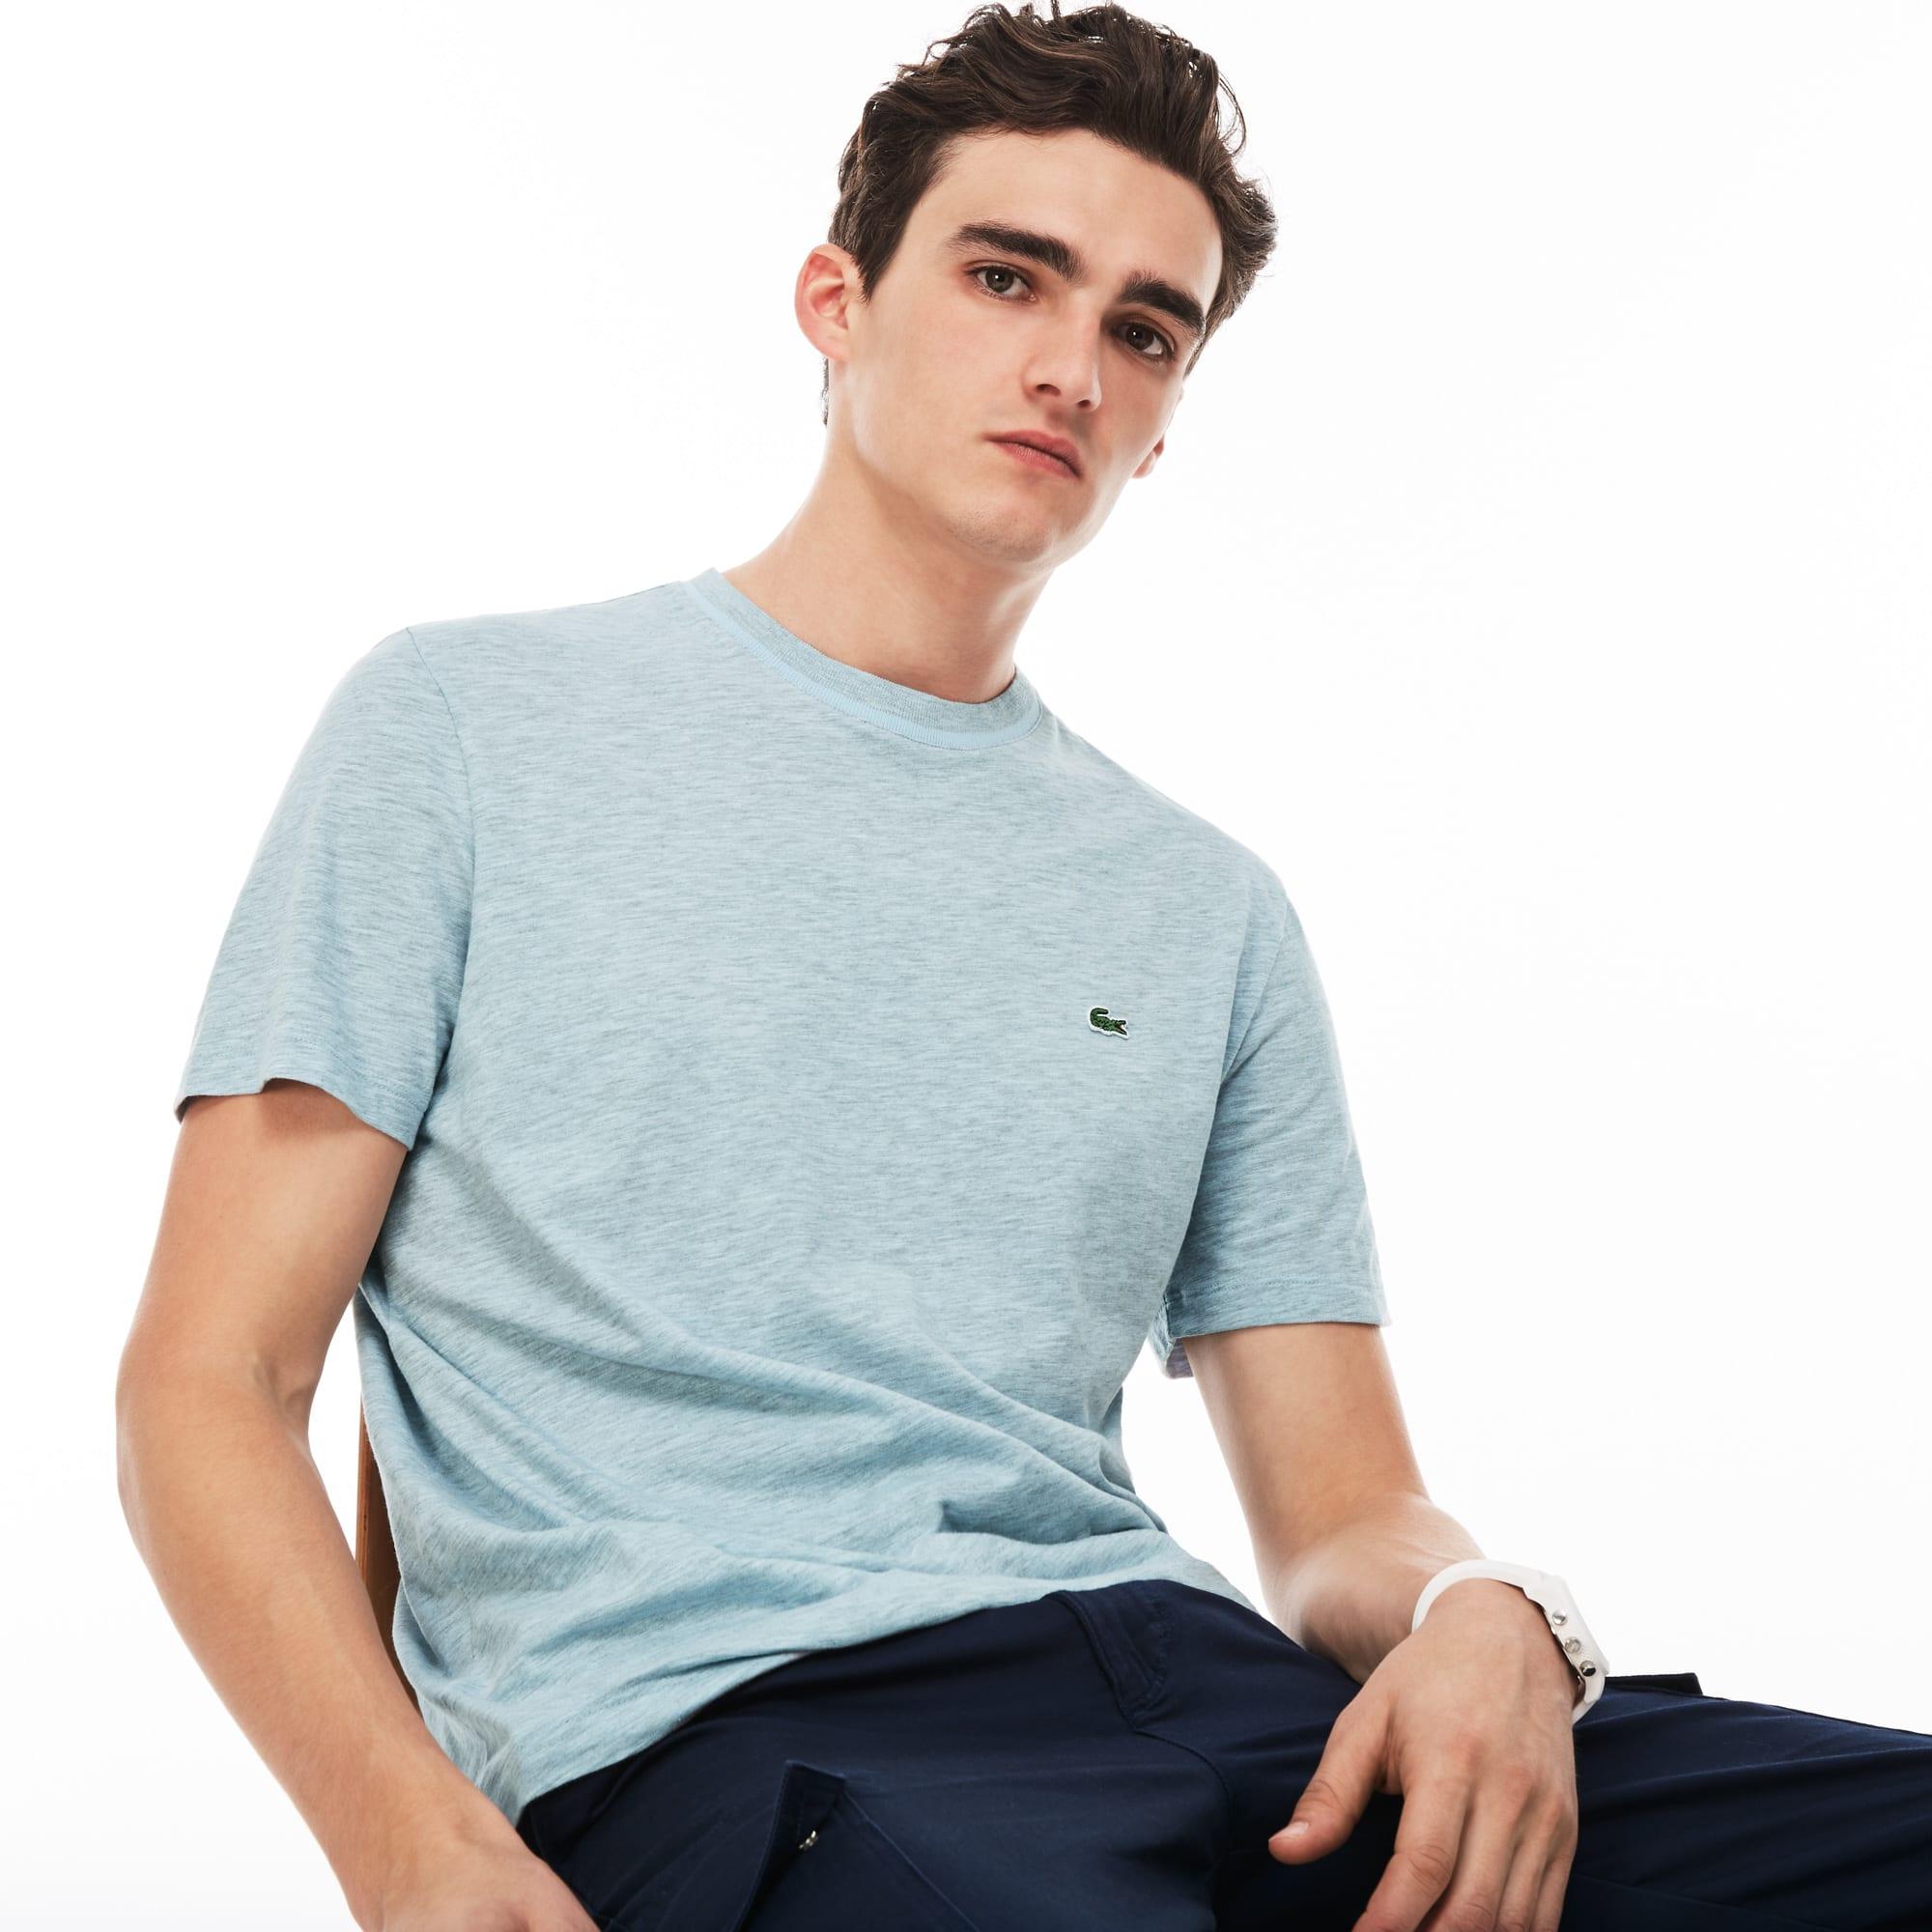 Camiseta de cuello redondo de punto jersey de algodón flameado liso